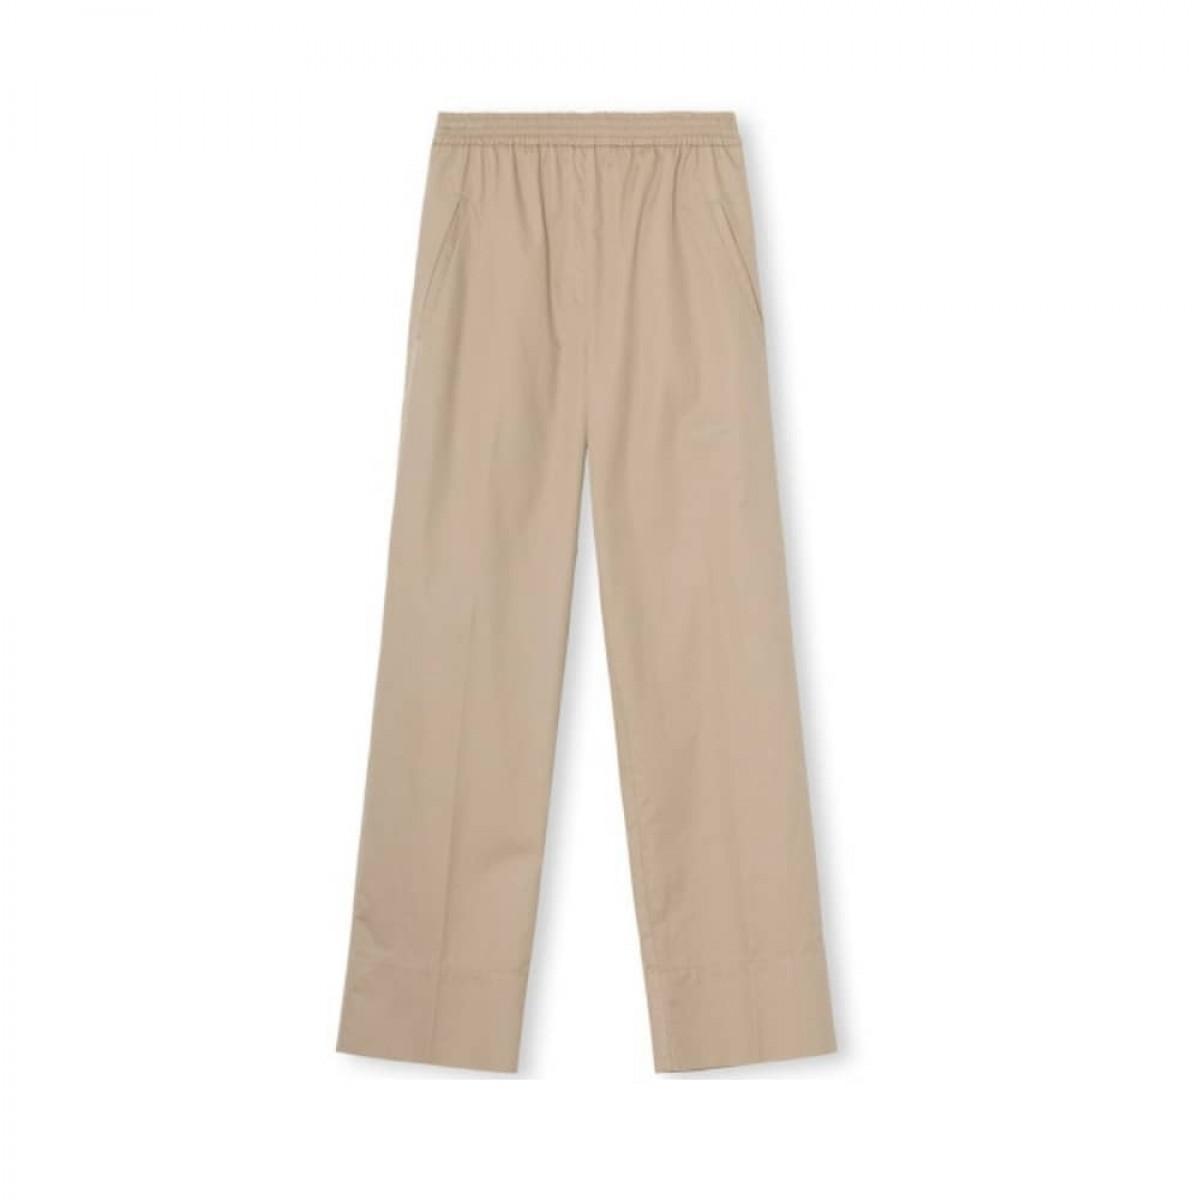 rose pants - rye